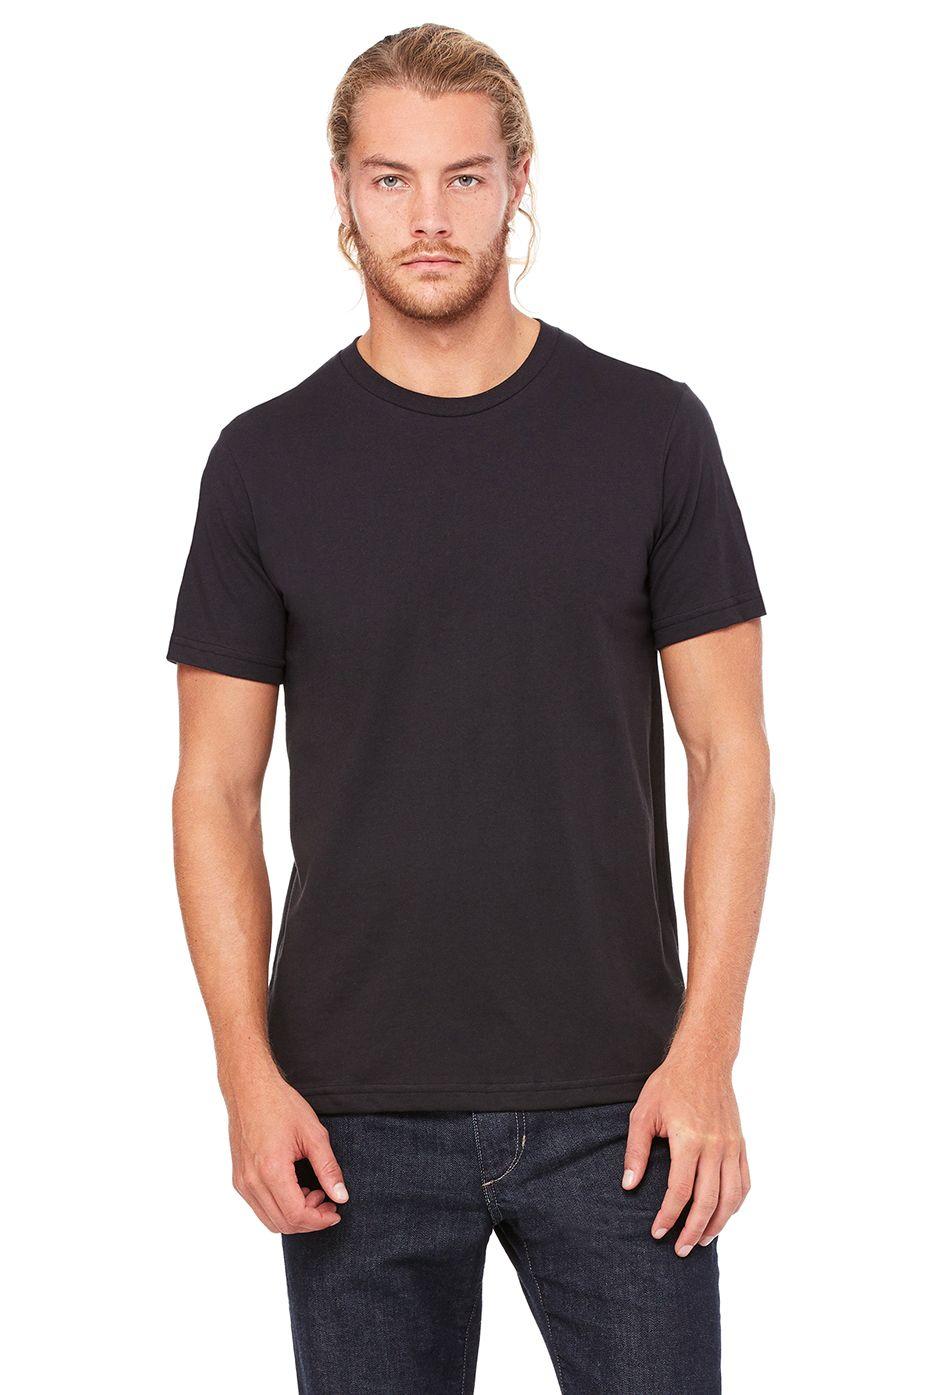 Blank Shirts Wholesale T Pocket